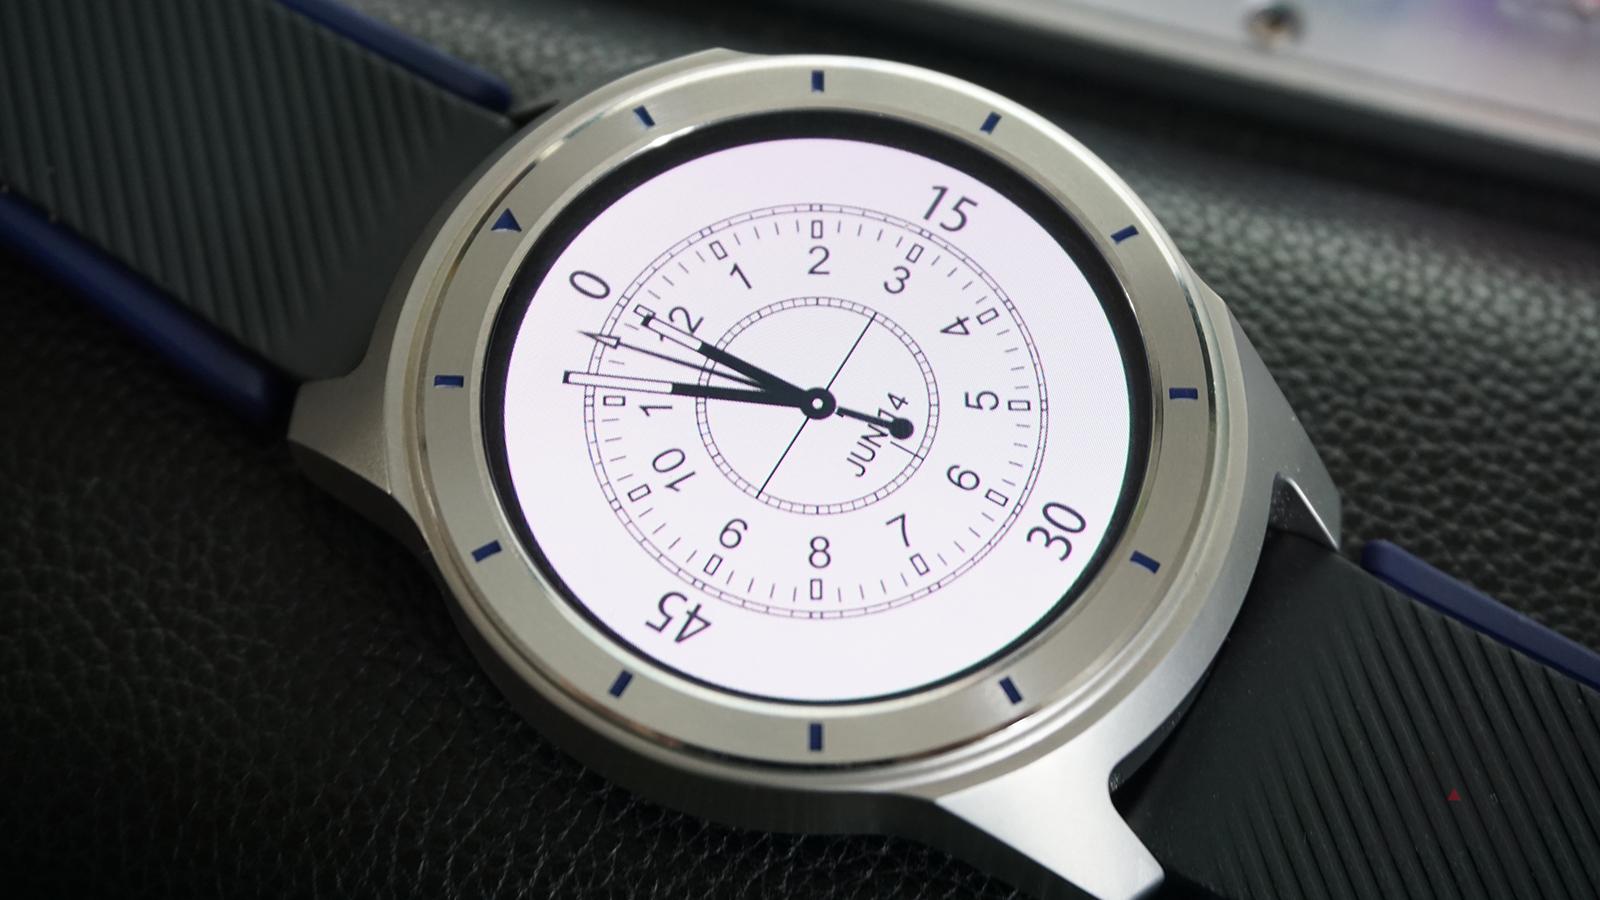 zte quartz watch price the